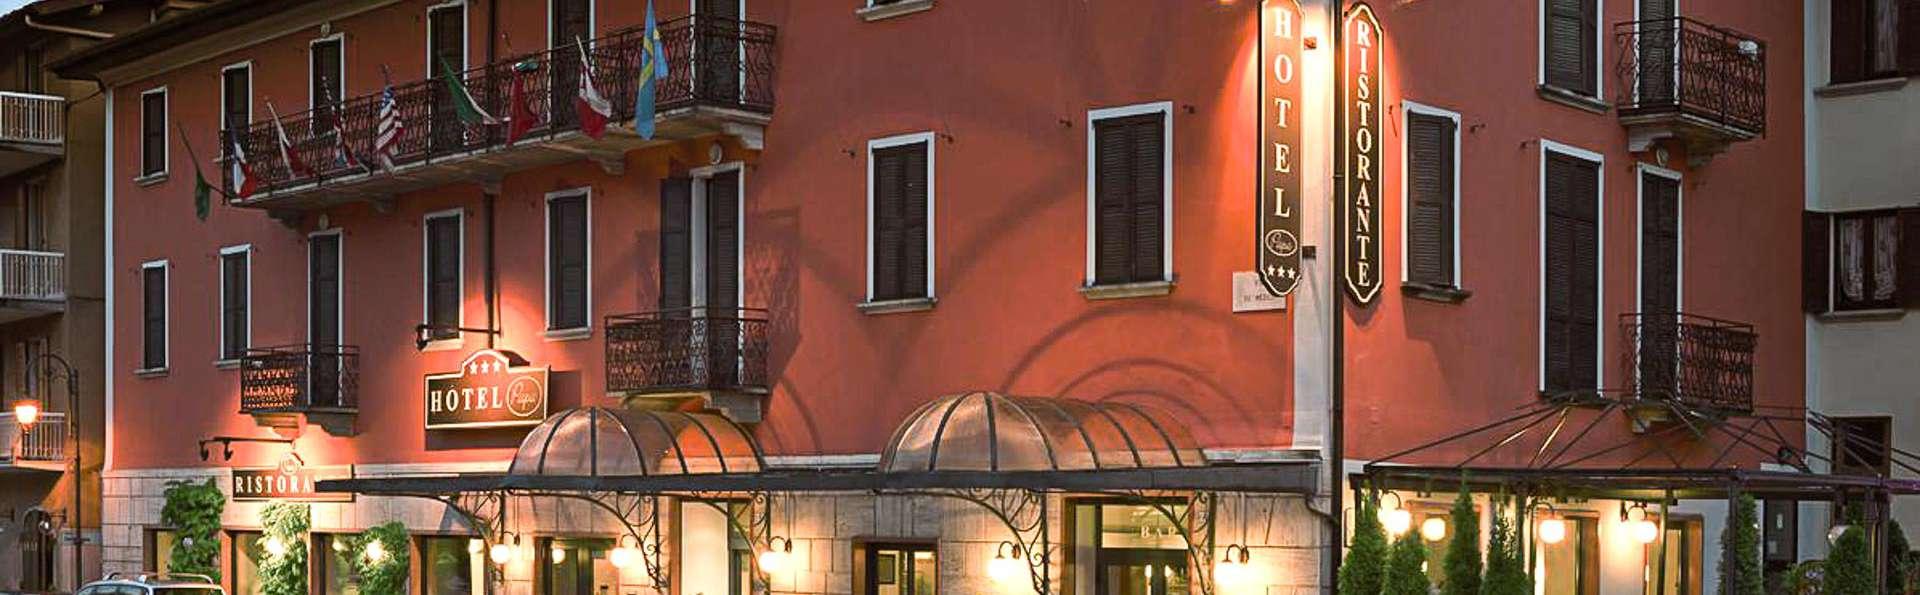 HG Hotel Papa - EDIT_FRONT_02.jpg